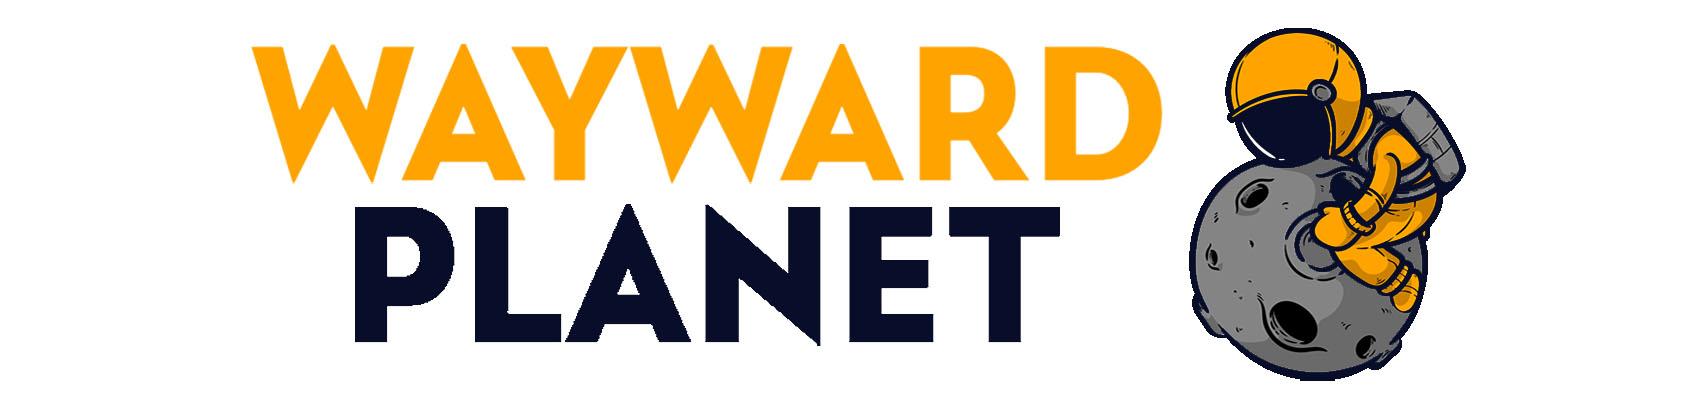 The Wayward Planet Logo